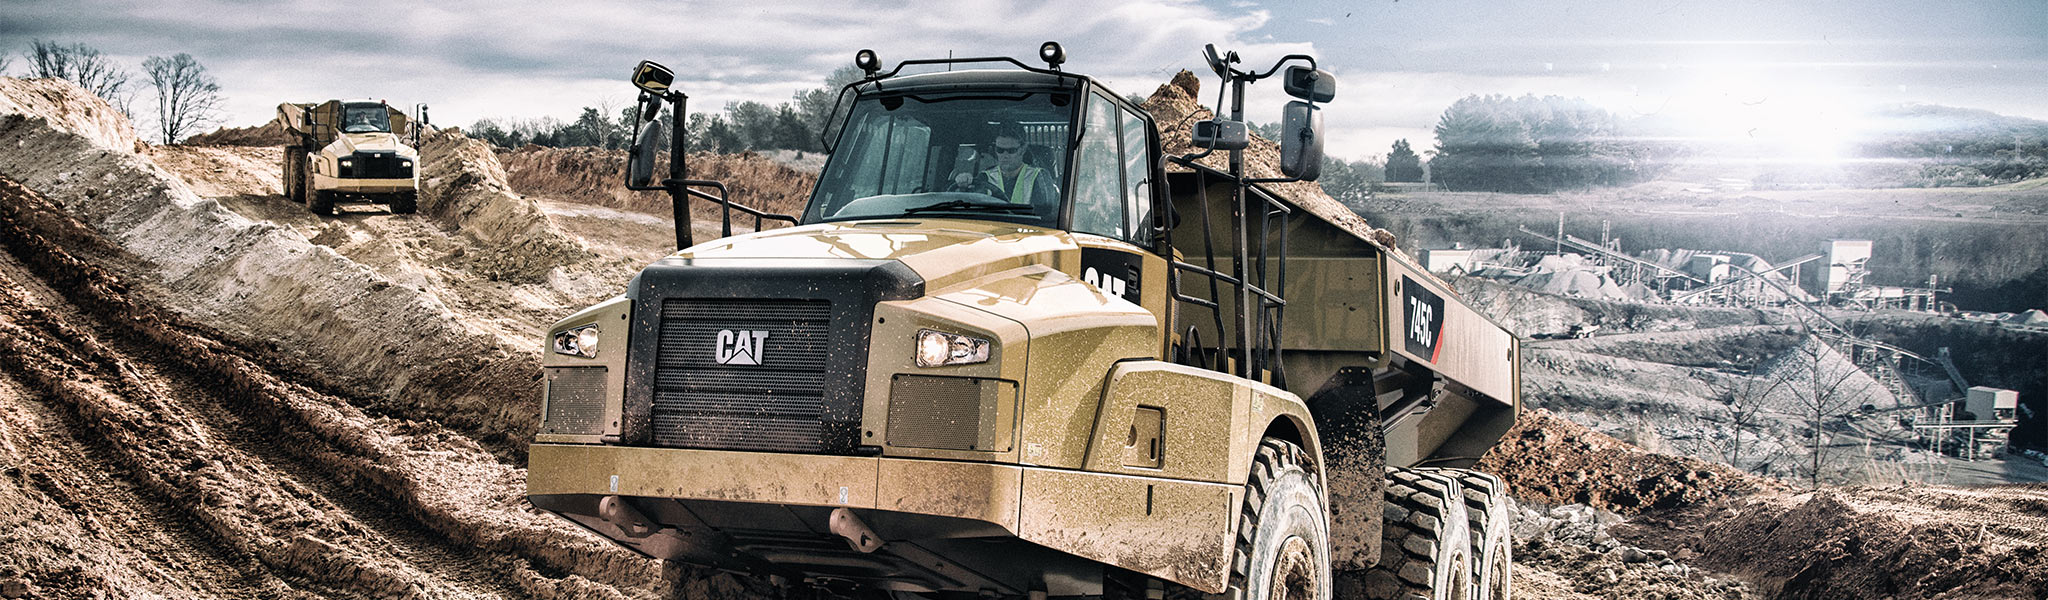 Cat Articulated Trucks: Move More, Make More